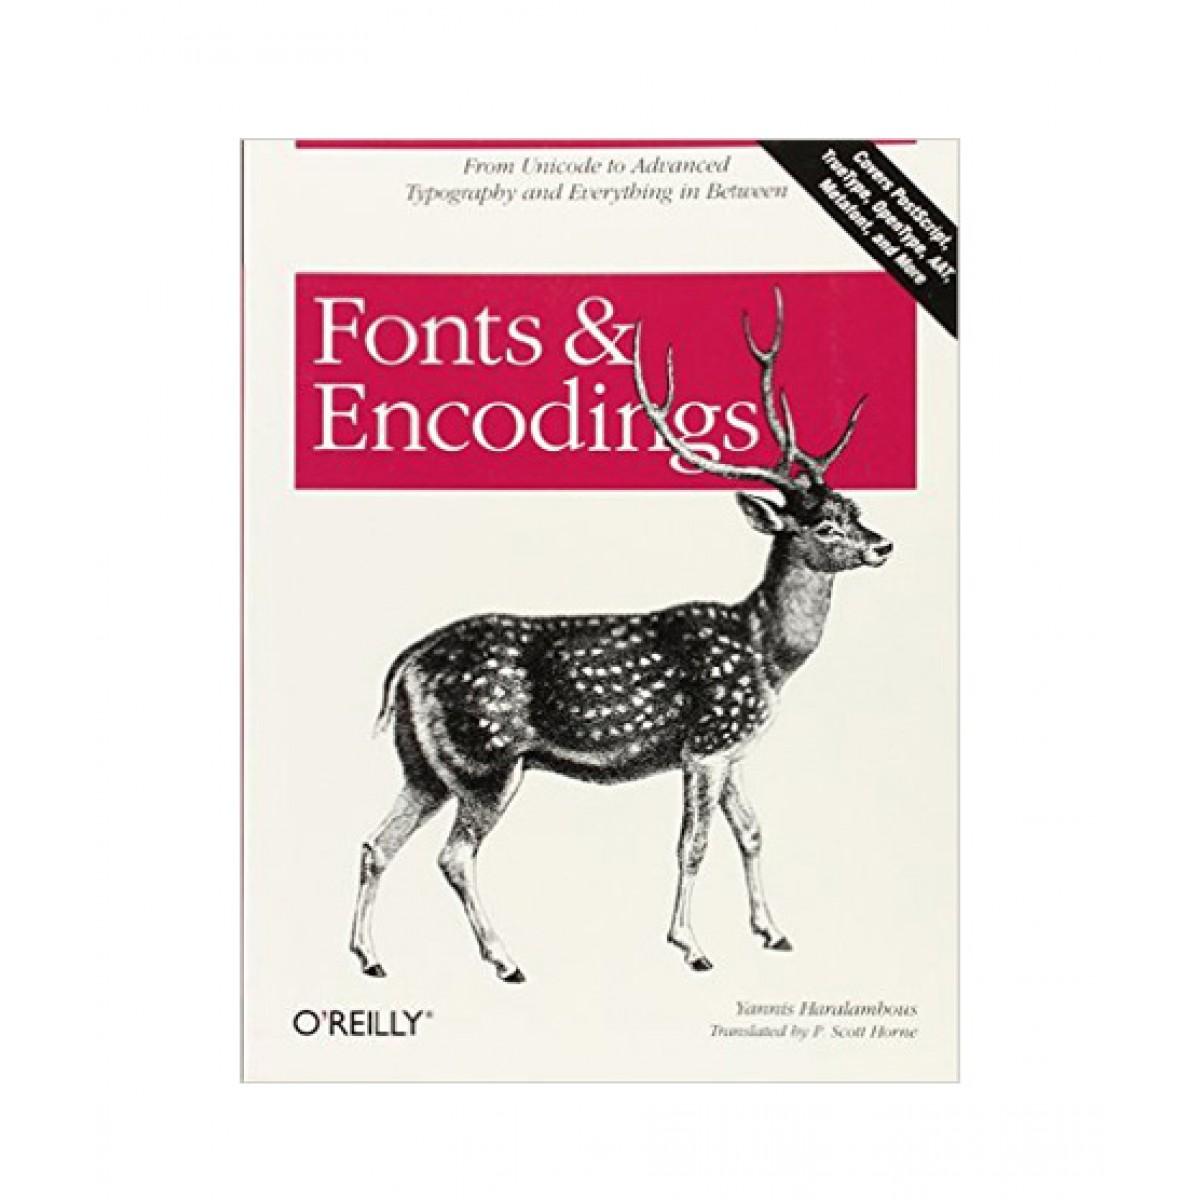 Fonts & Encodings Book